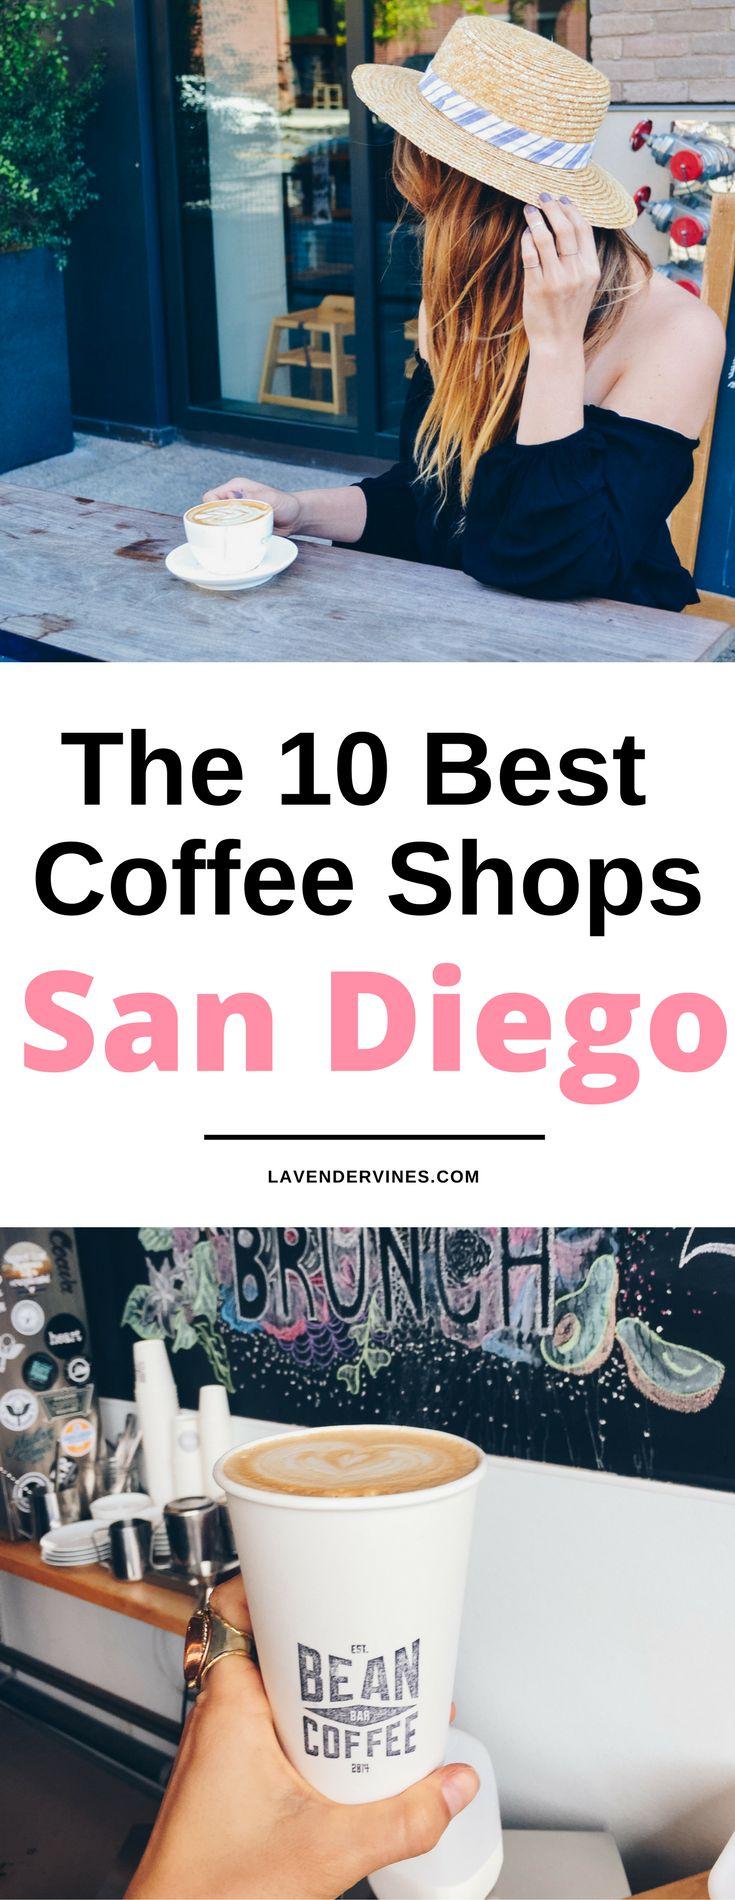 San Diego Best Coffee Shops, San Diego things to do, San Diego food, San Diego travel, San Diego trip #sandiego #sandiegocalifornia